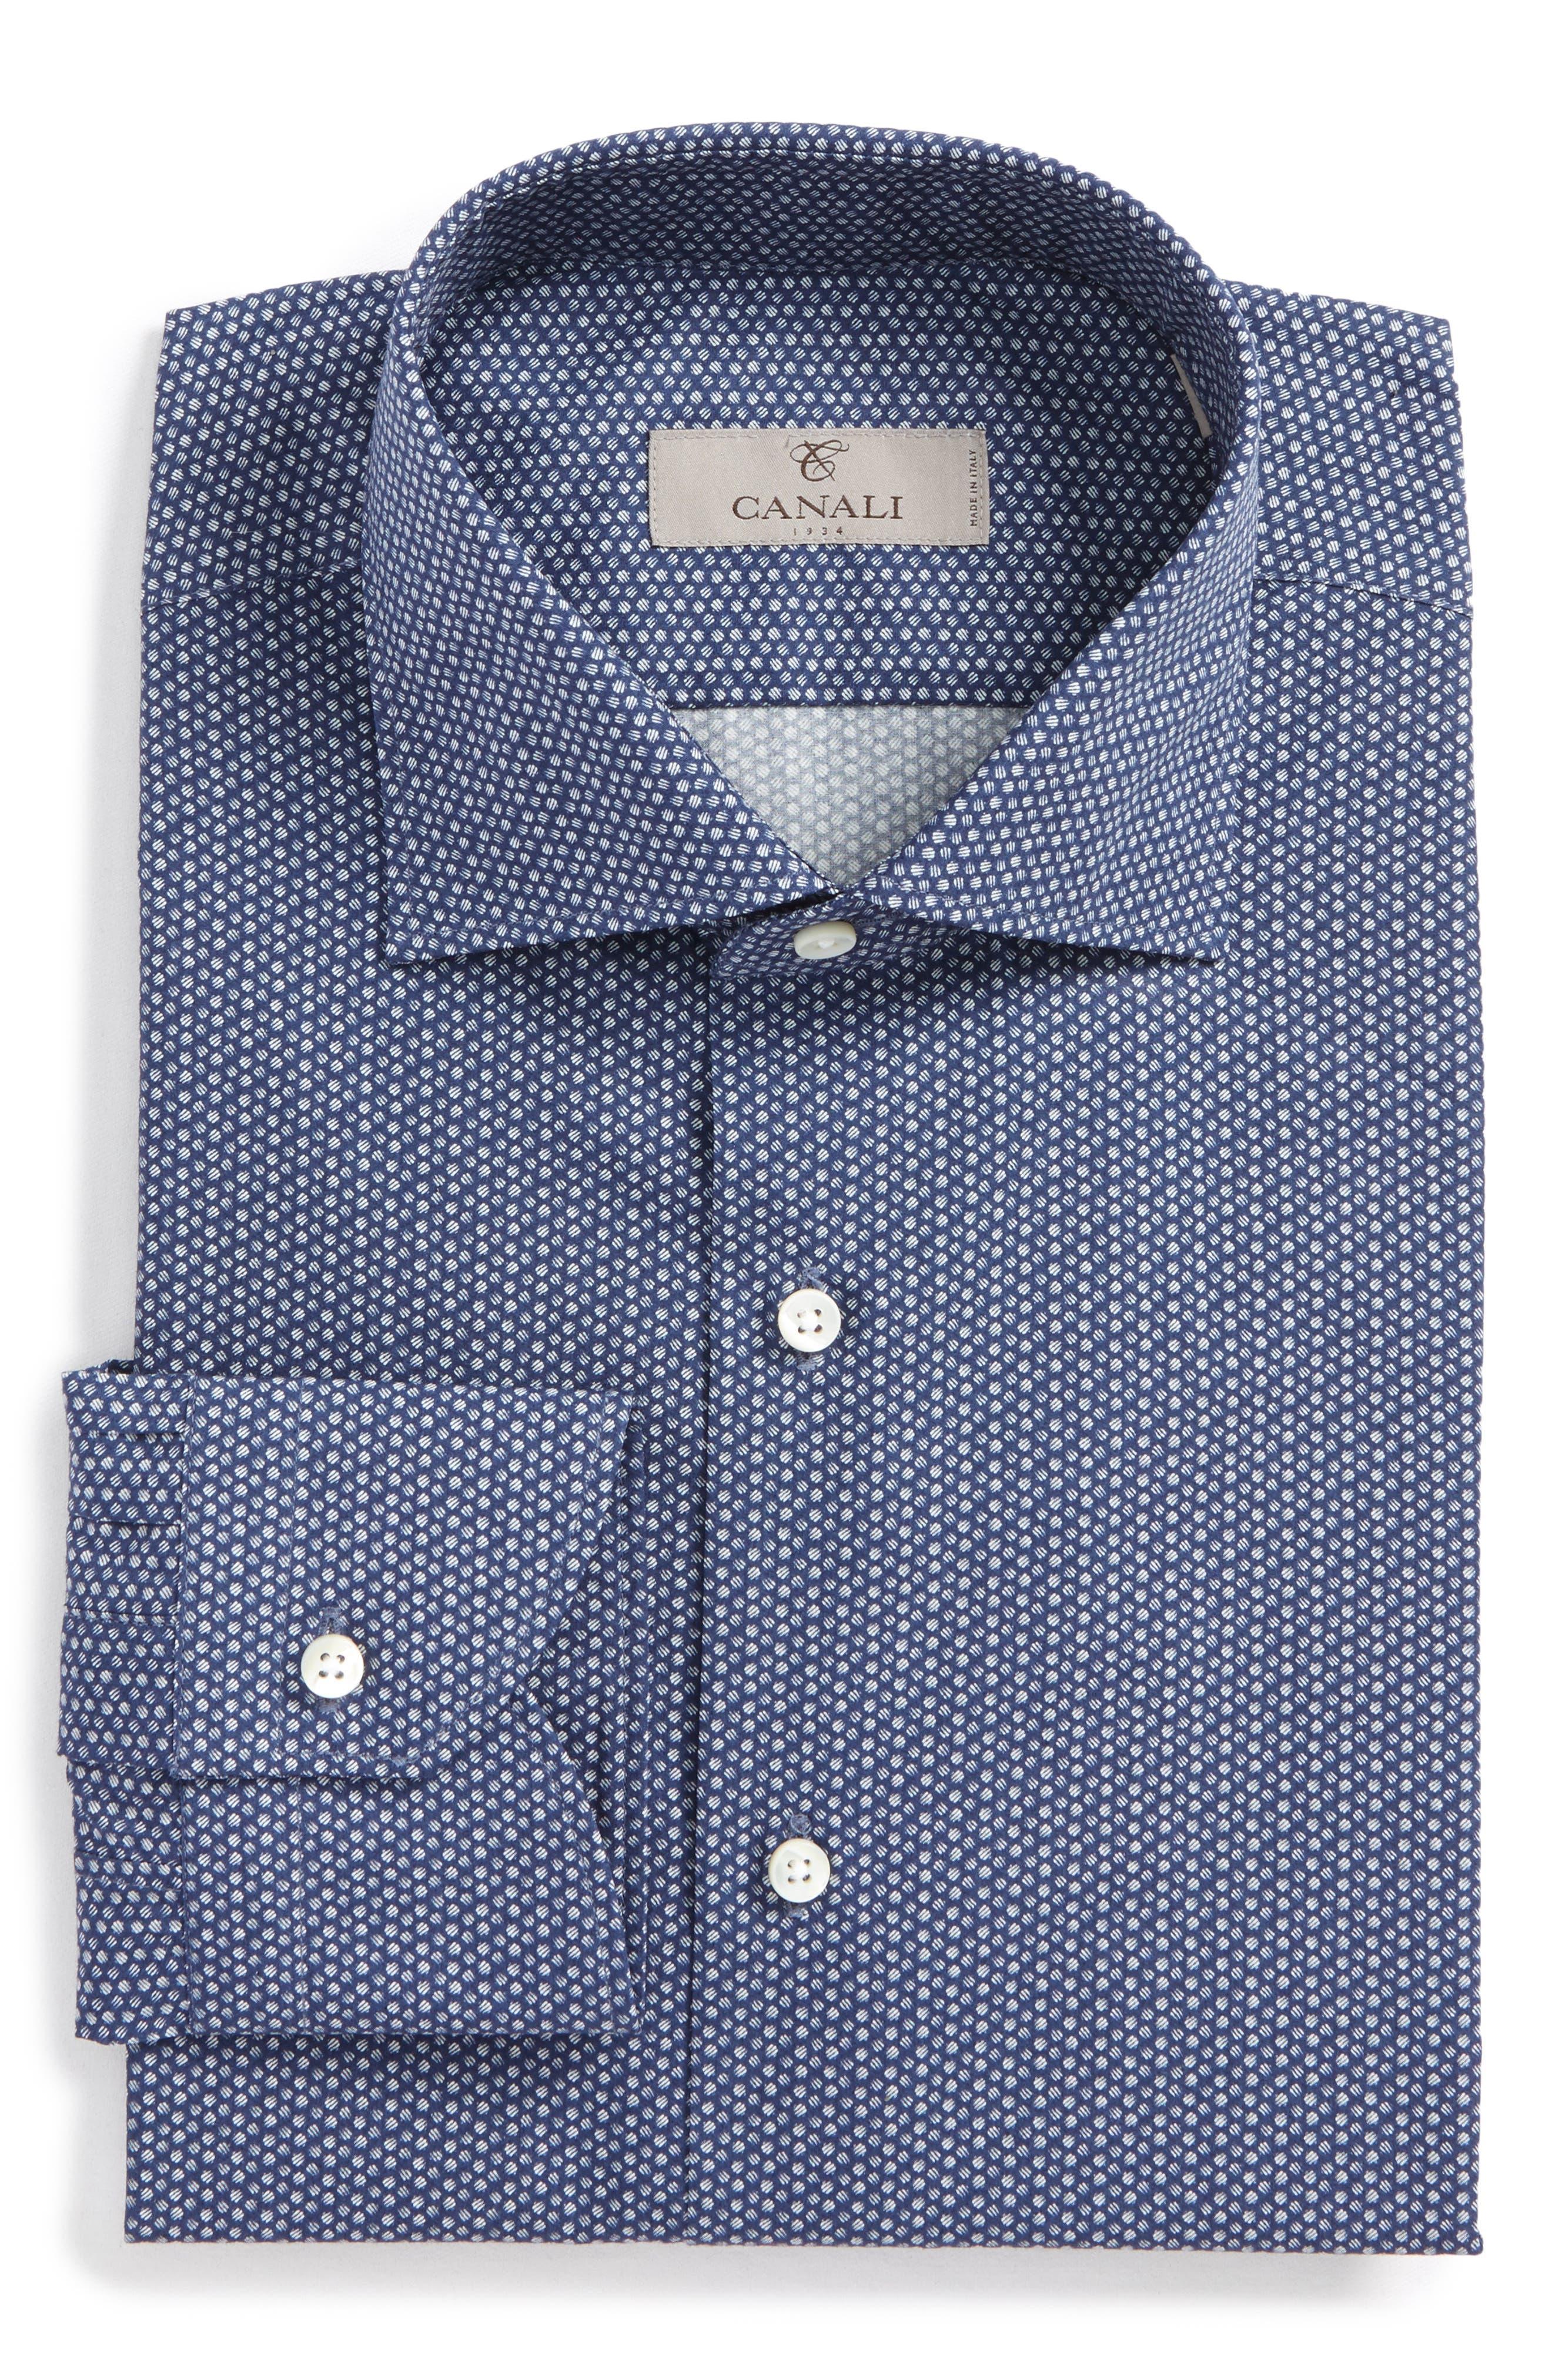 Regular Fit Dot Dress Shirt,                             Main thumbnail 1, color,                             405